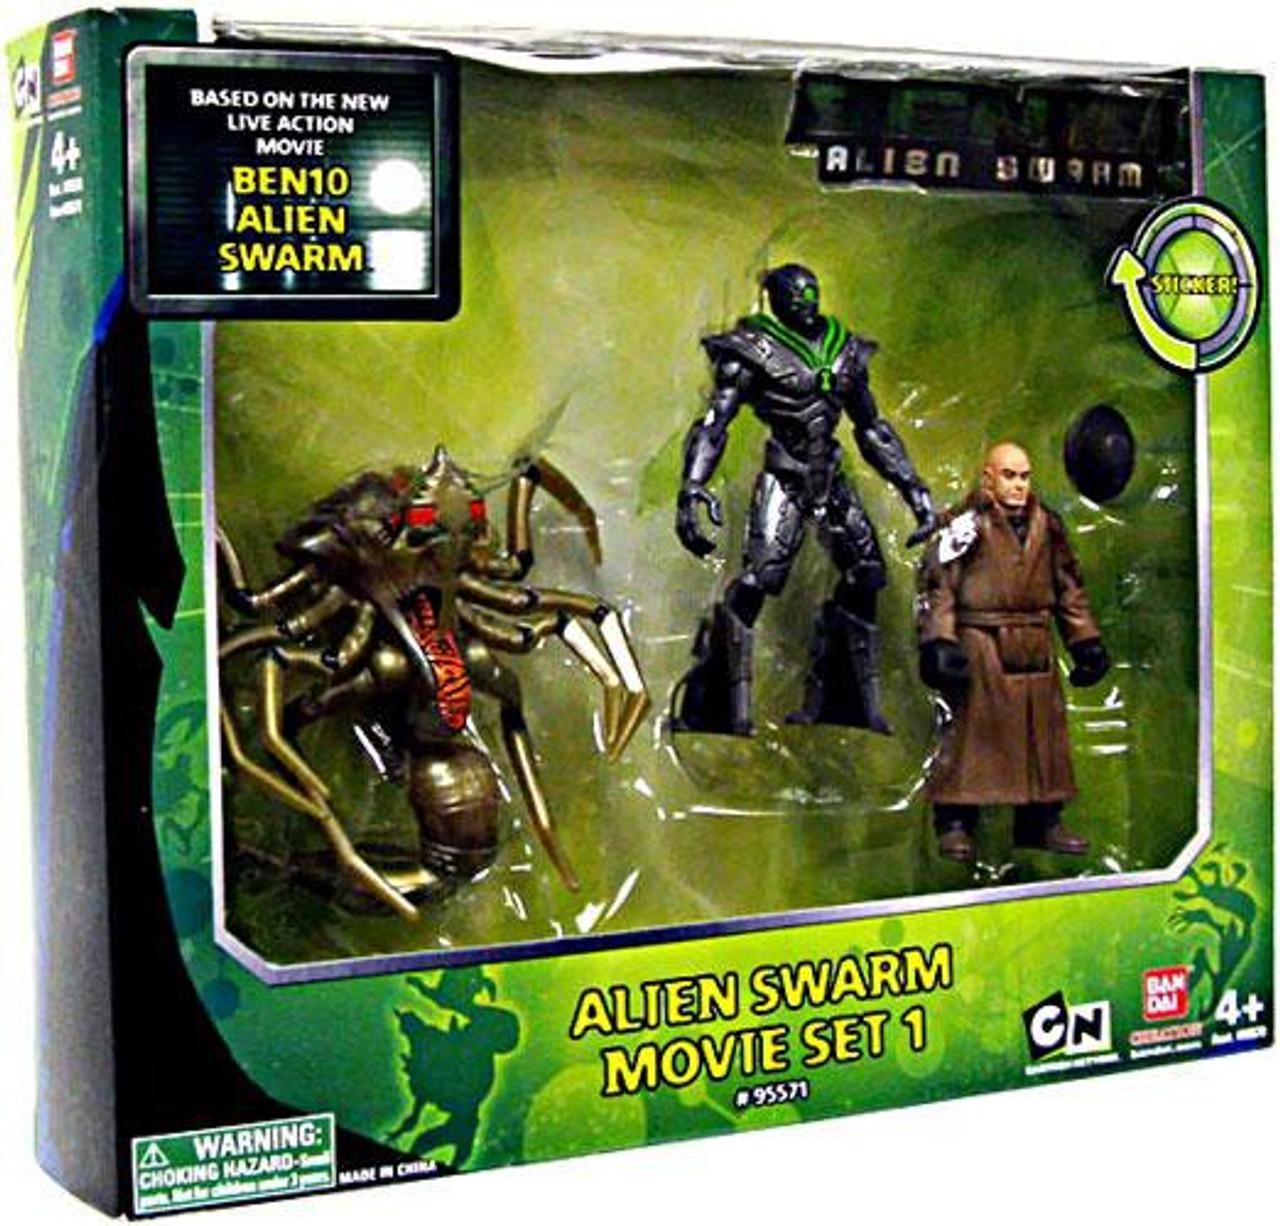 Ben 10 Alien Swarm Movie Set 1 Action Figure 3-Pack Set